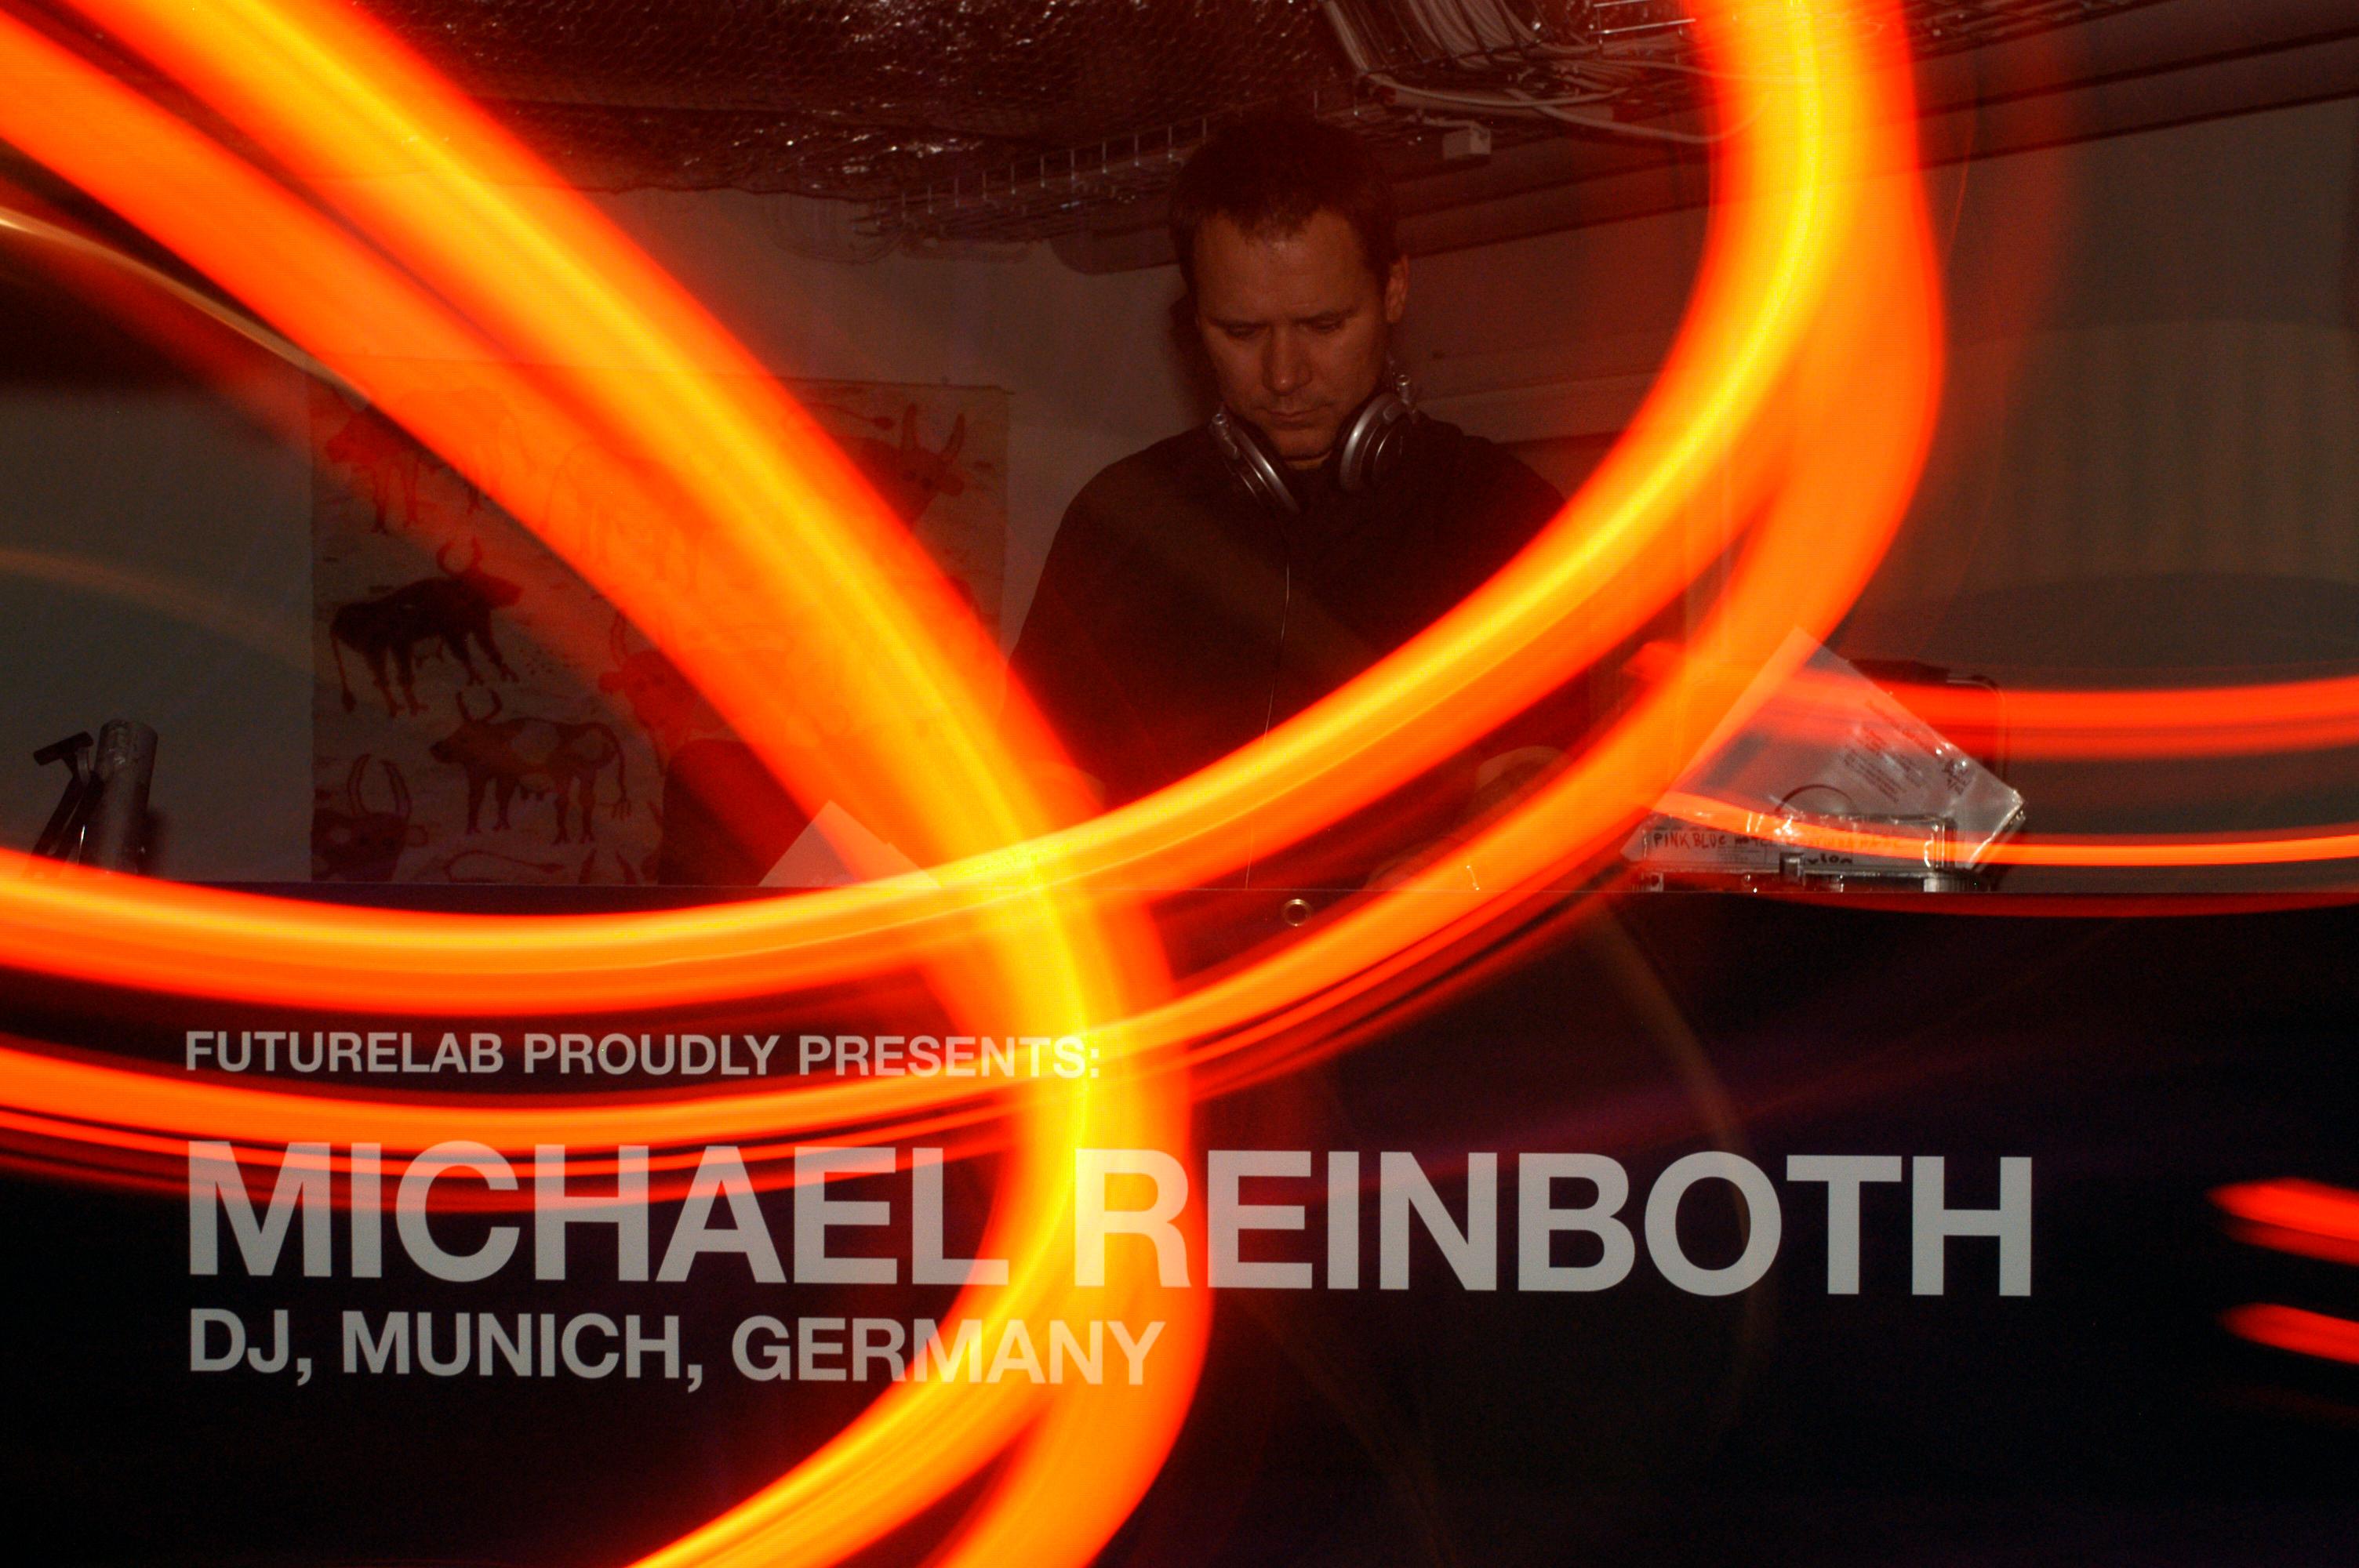 Michael Reinboth